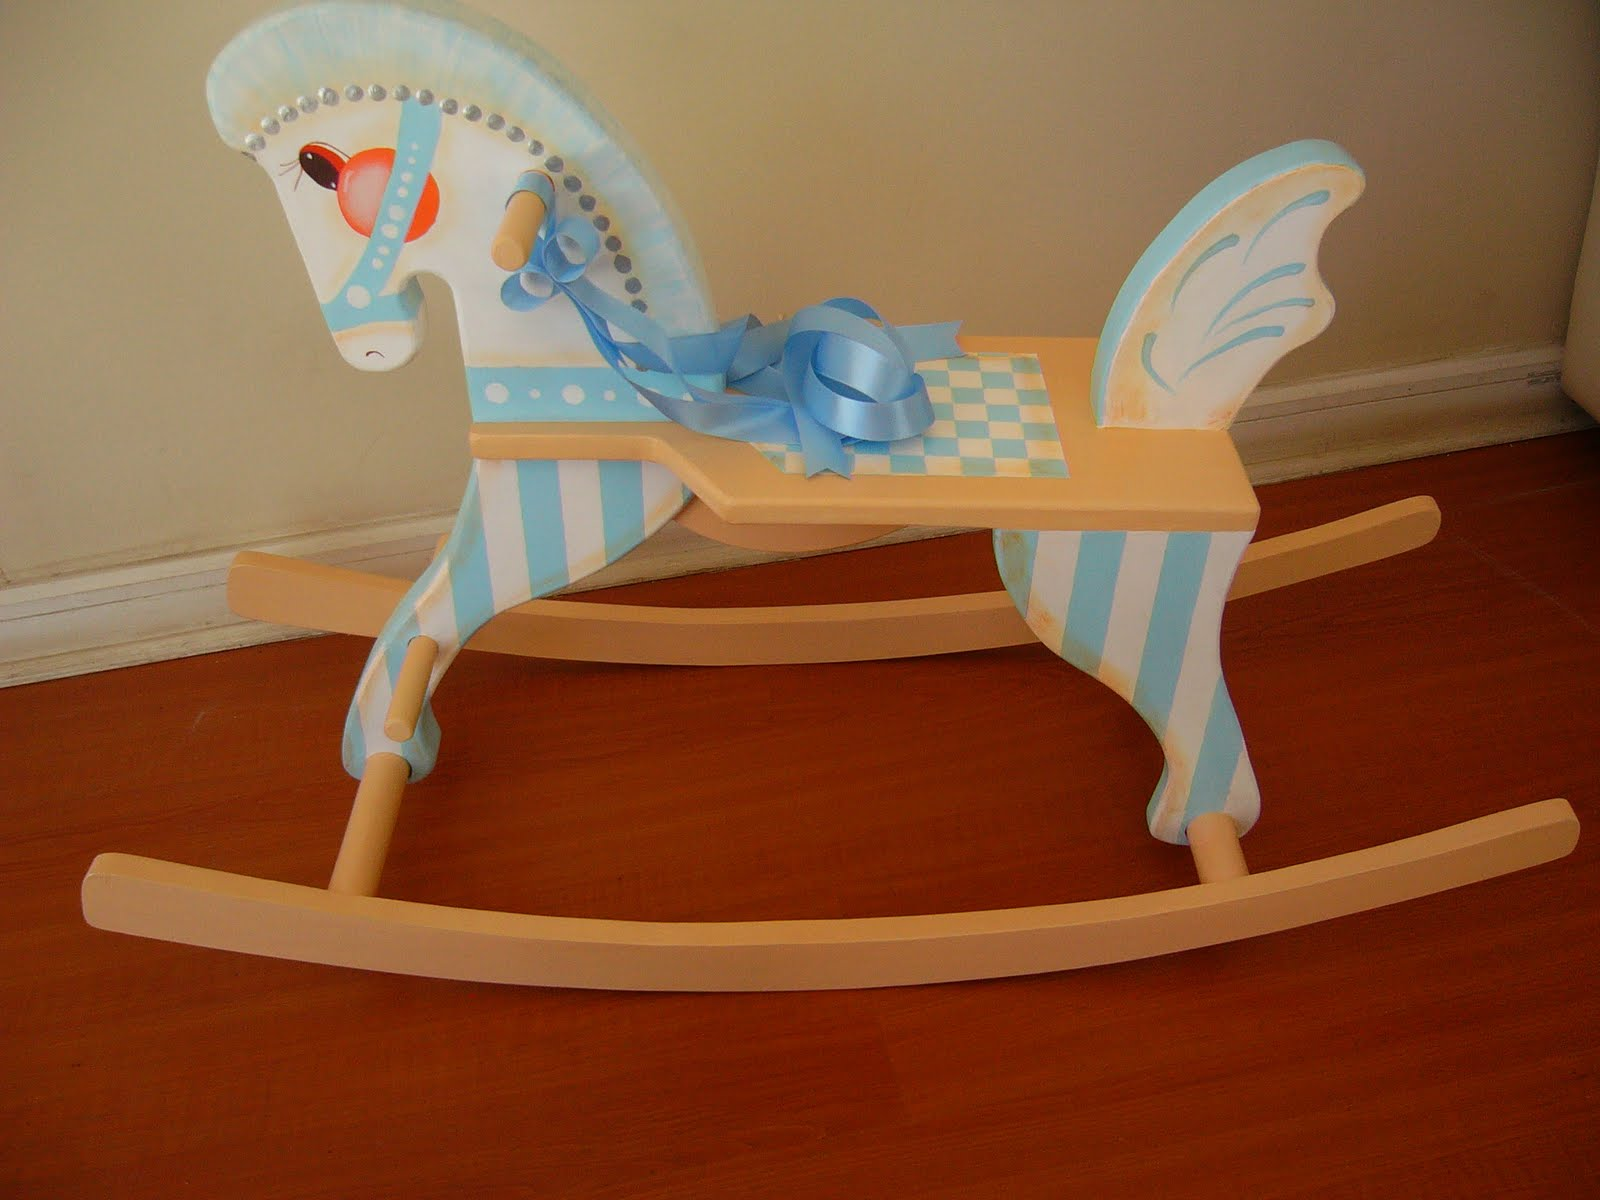 Muebles infantiles decoraci n para ni os juguetes for Manualidades de muebles